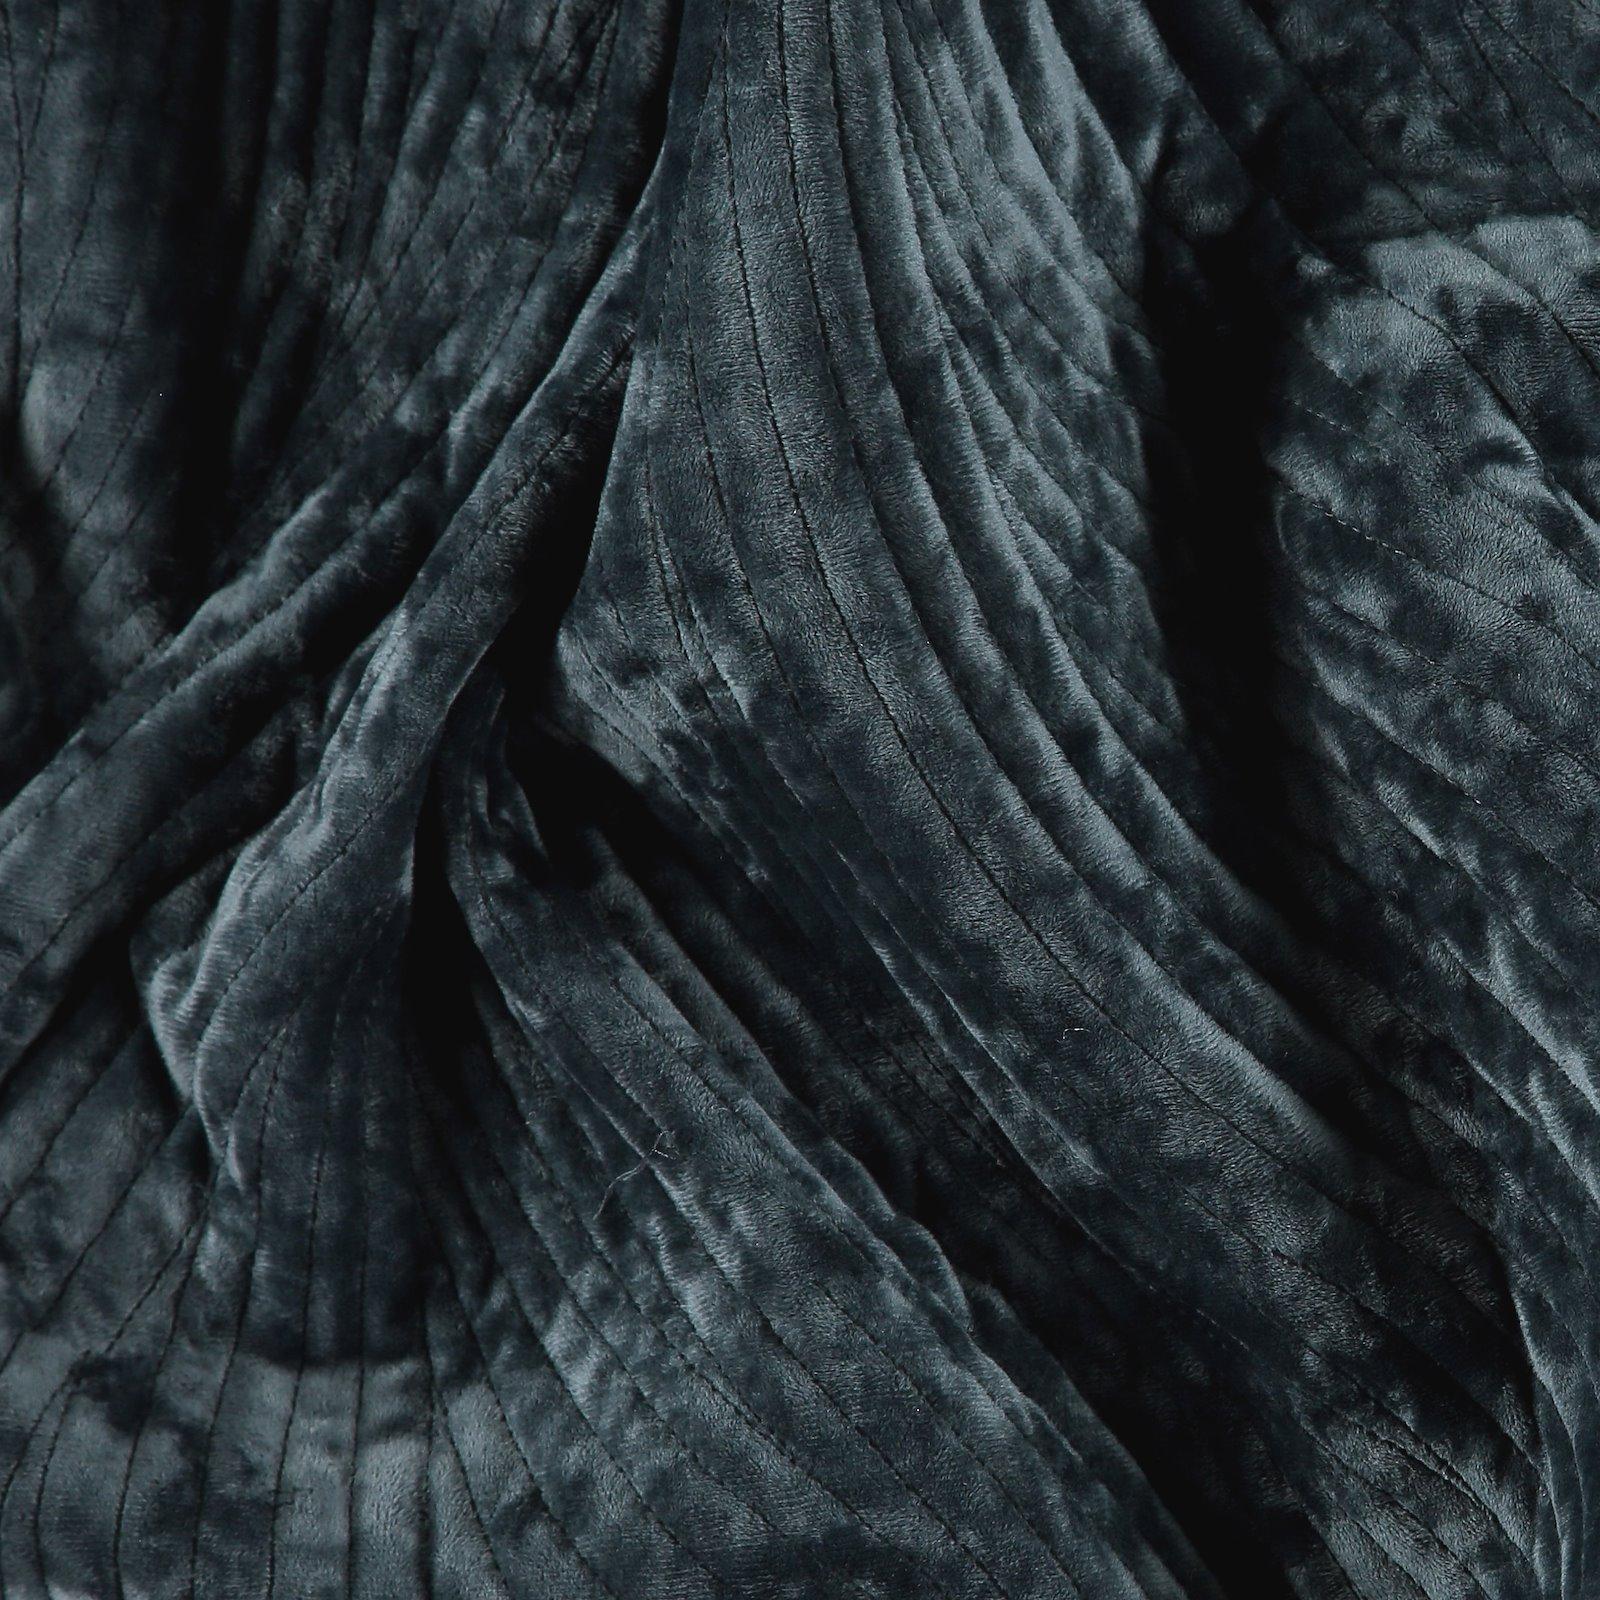 Quilt velvet blue grey abstract pattern 920216_pack